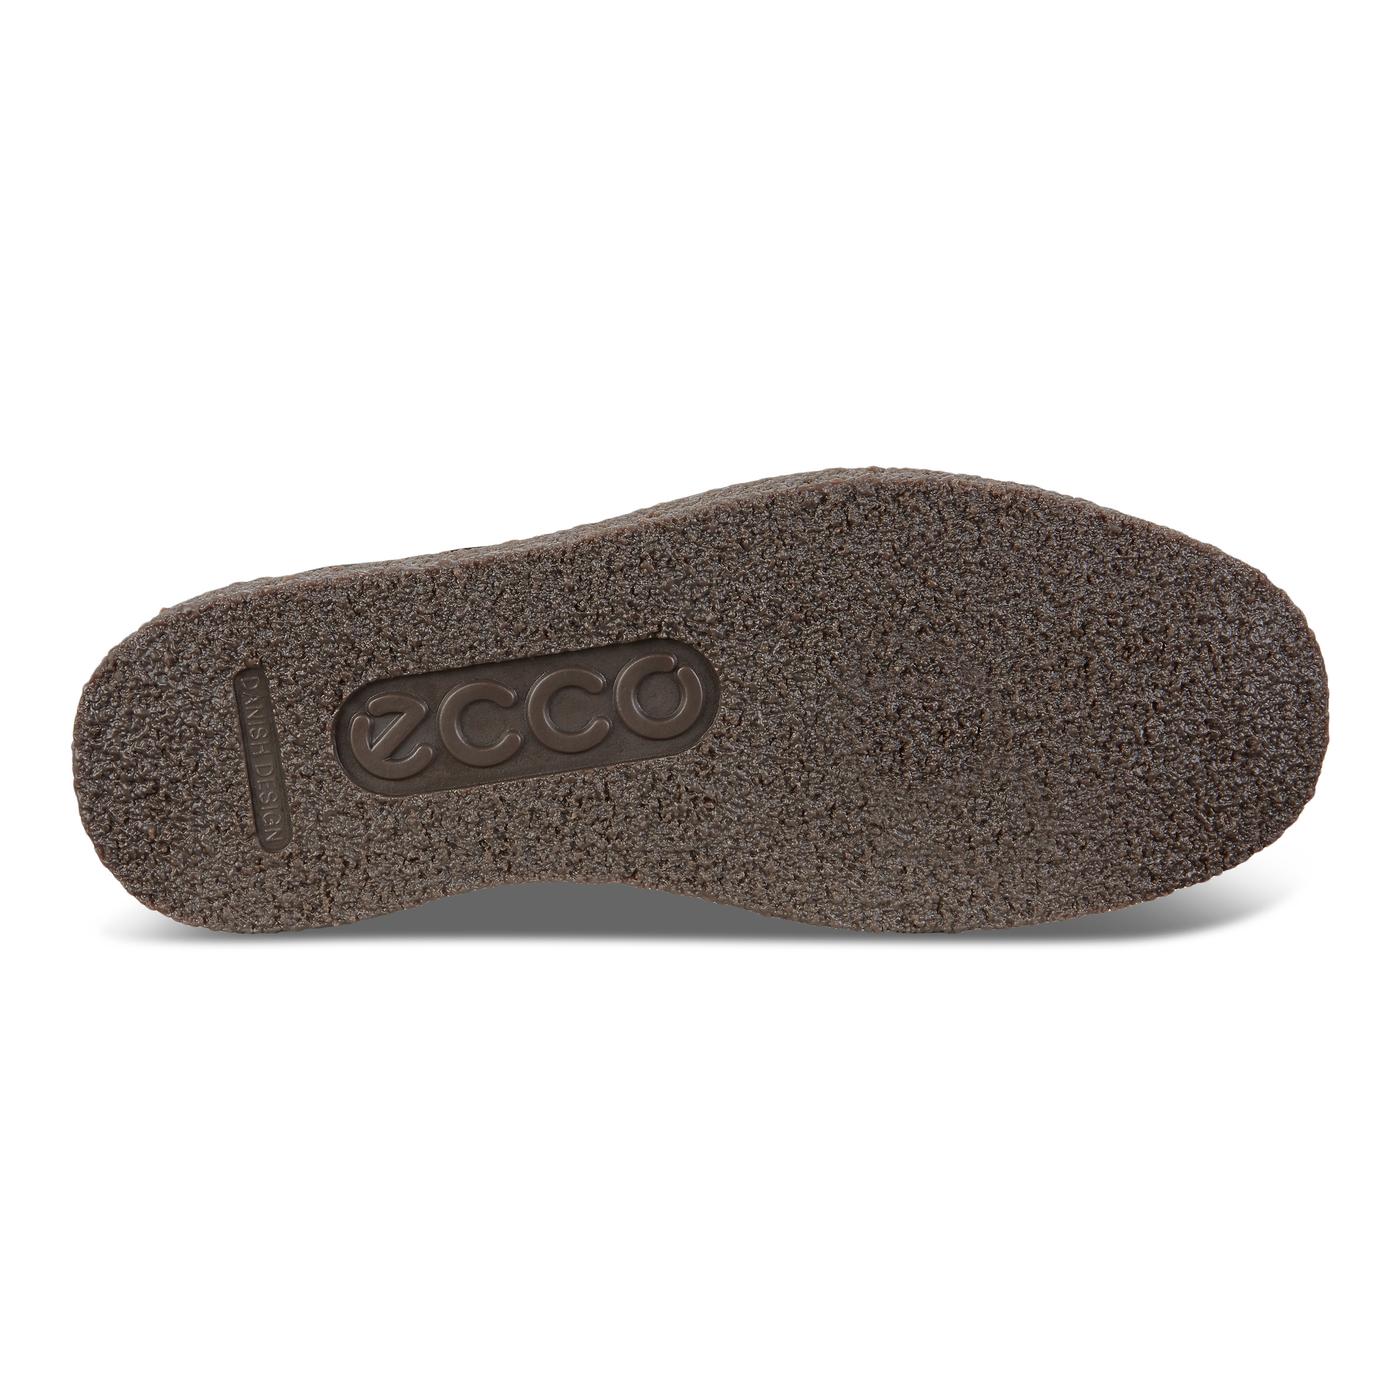 ECCO Crepetray Women's Shoe